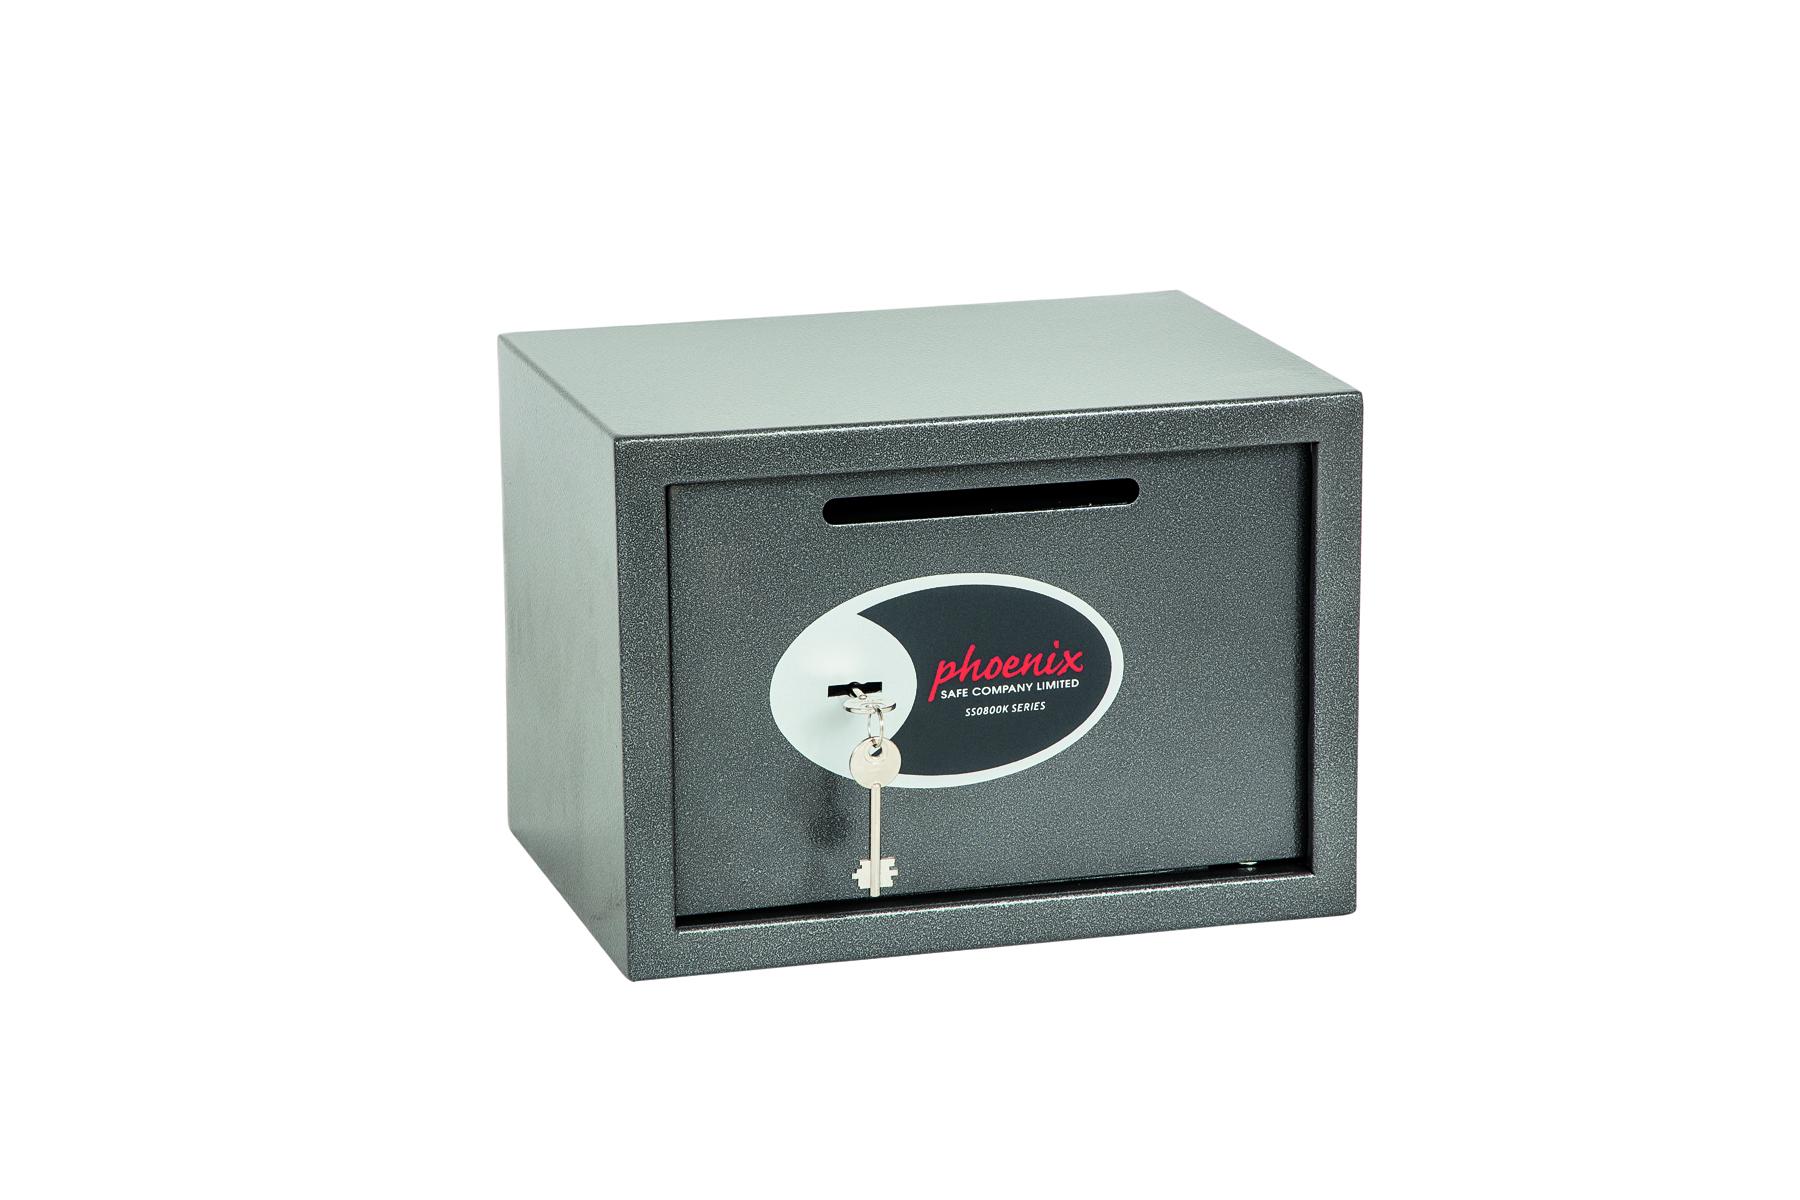 Phoenix Vela Deposit Home and Office Size 2 Safe Key Lock Graphite Grey SS0802KD